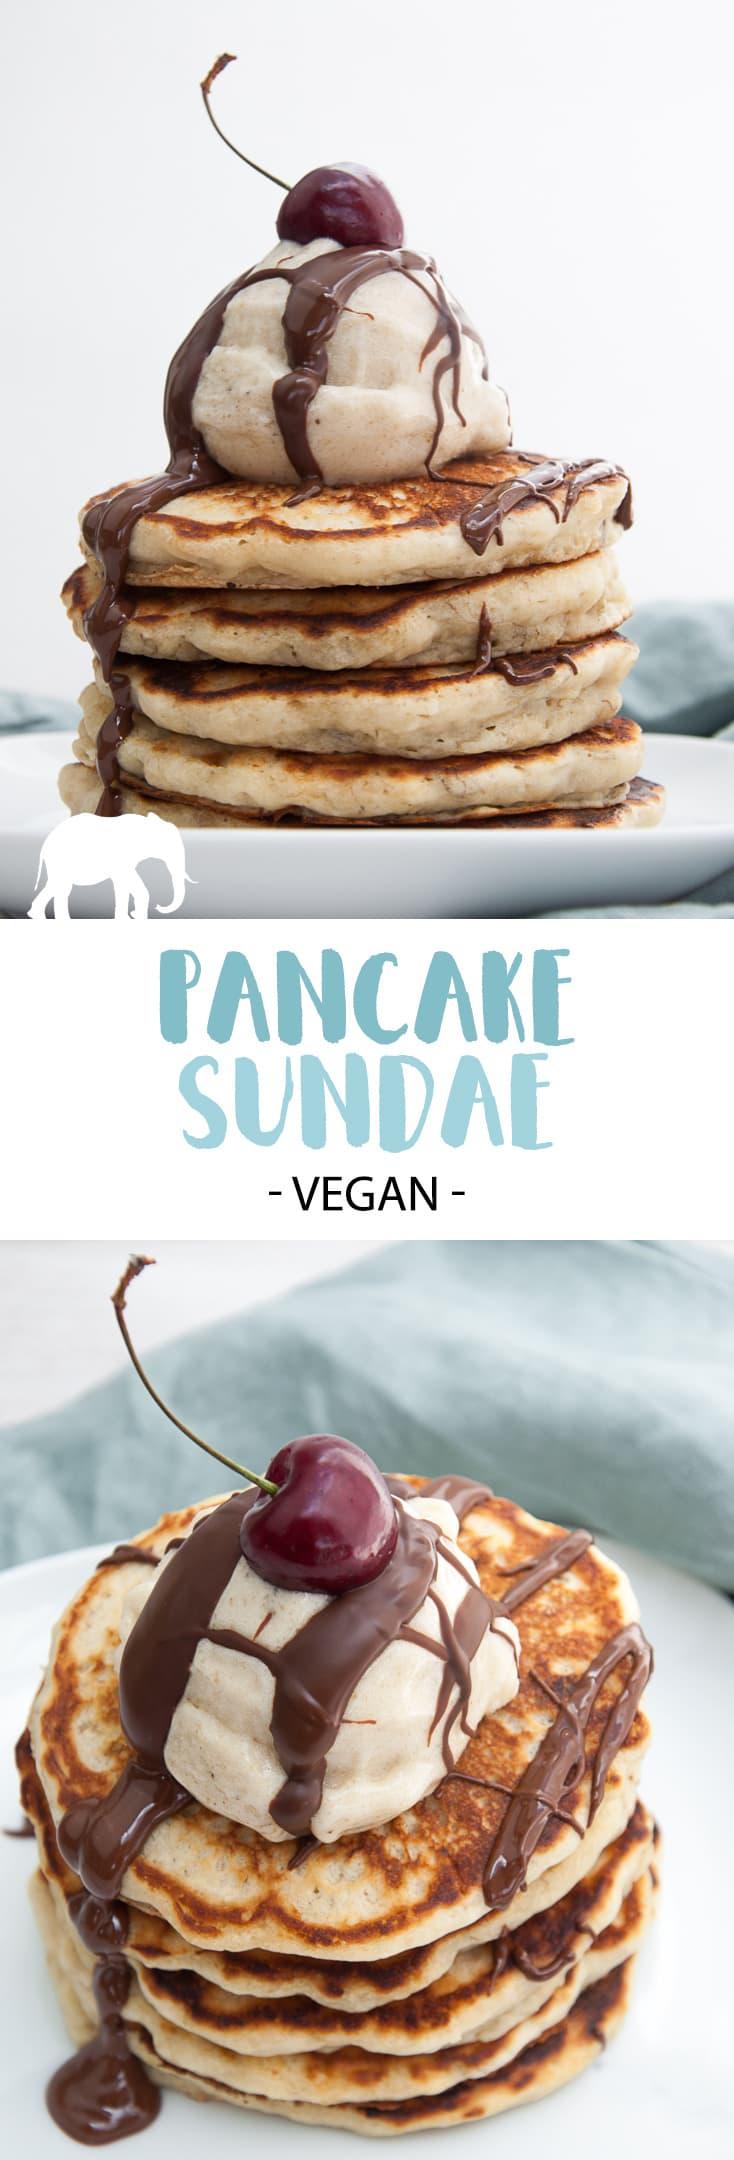 Vegan Pancake Sundae #vegan #pancake #sundae #pancakes